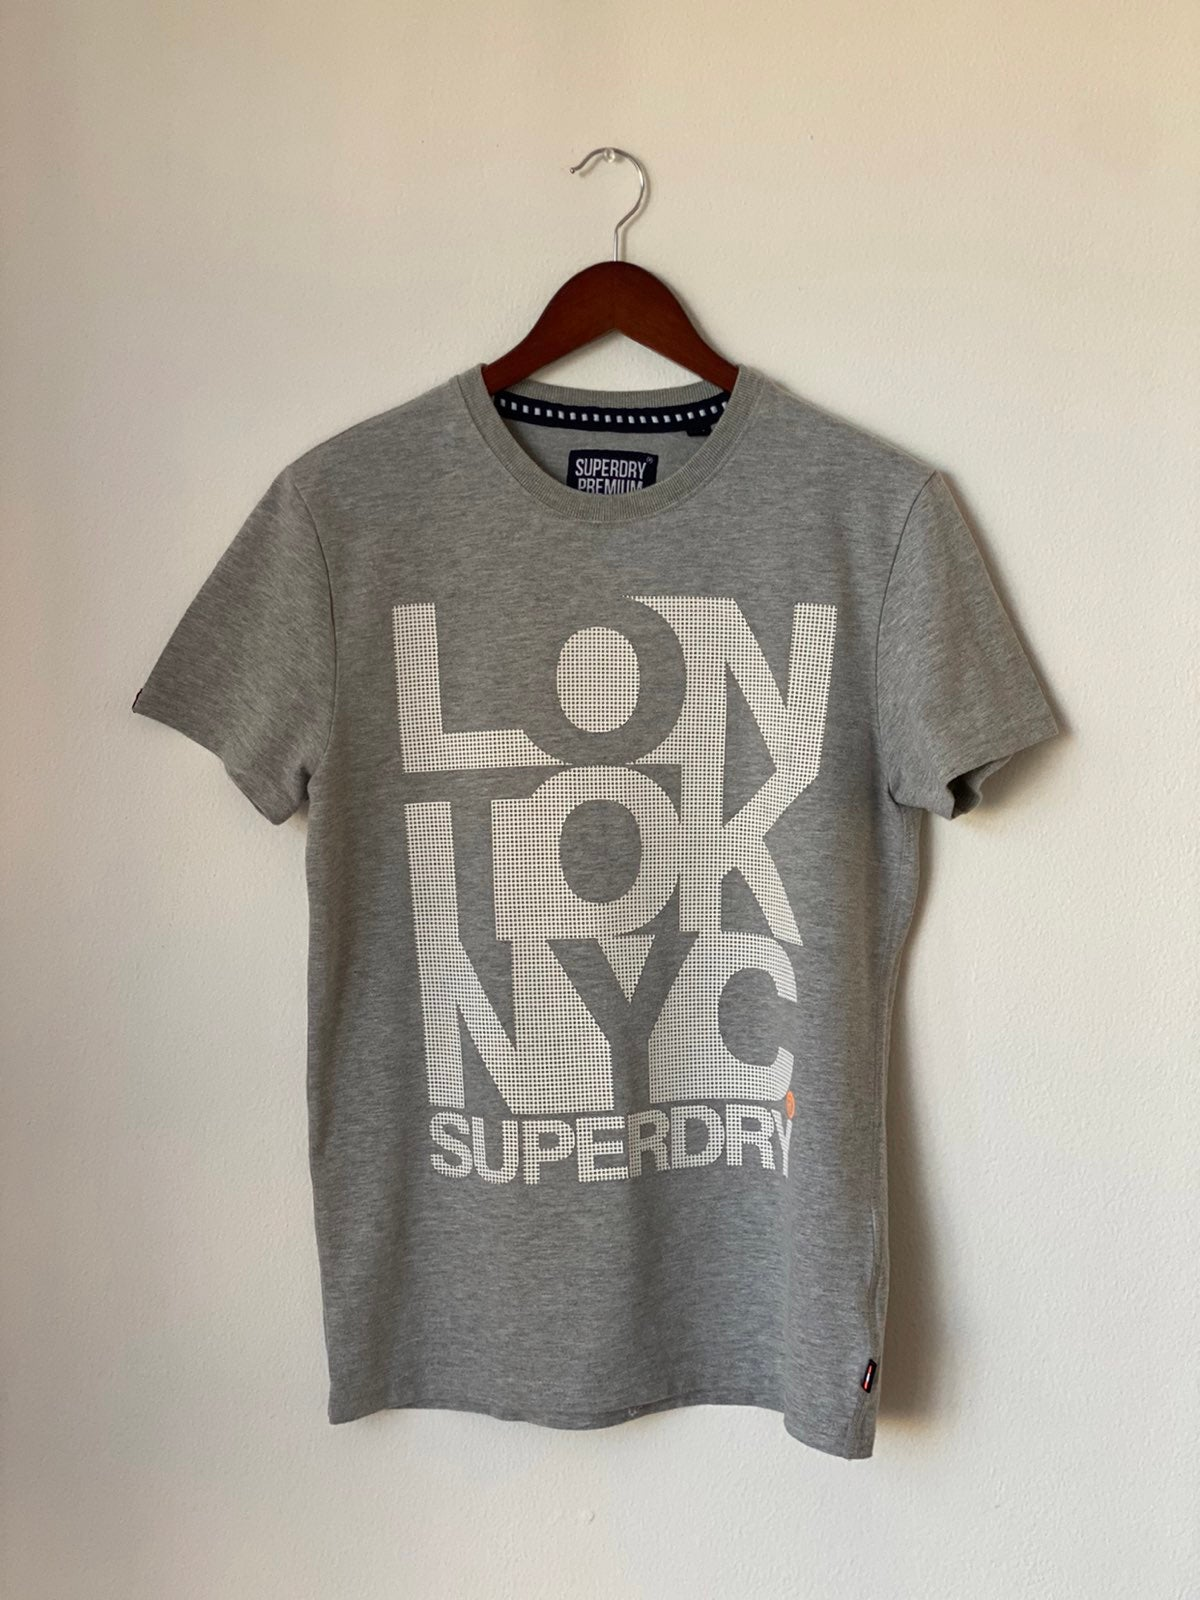 Superdry T-Shirt Sz S